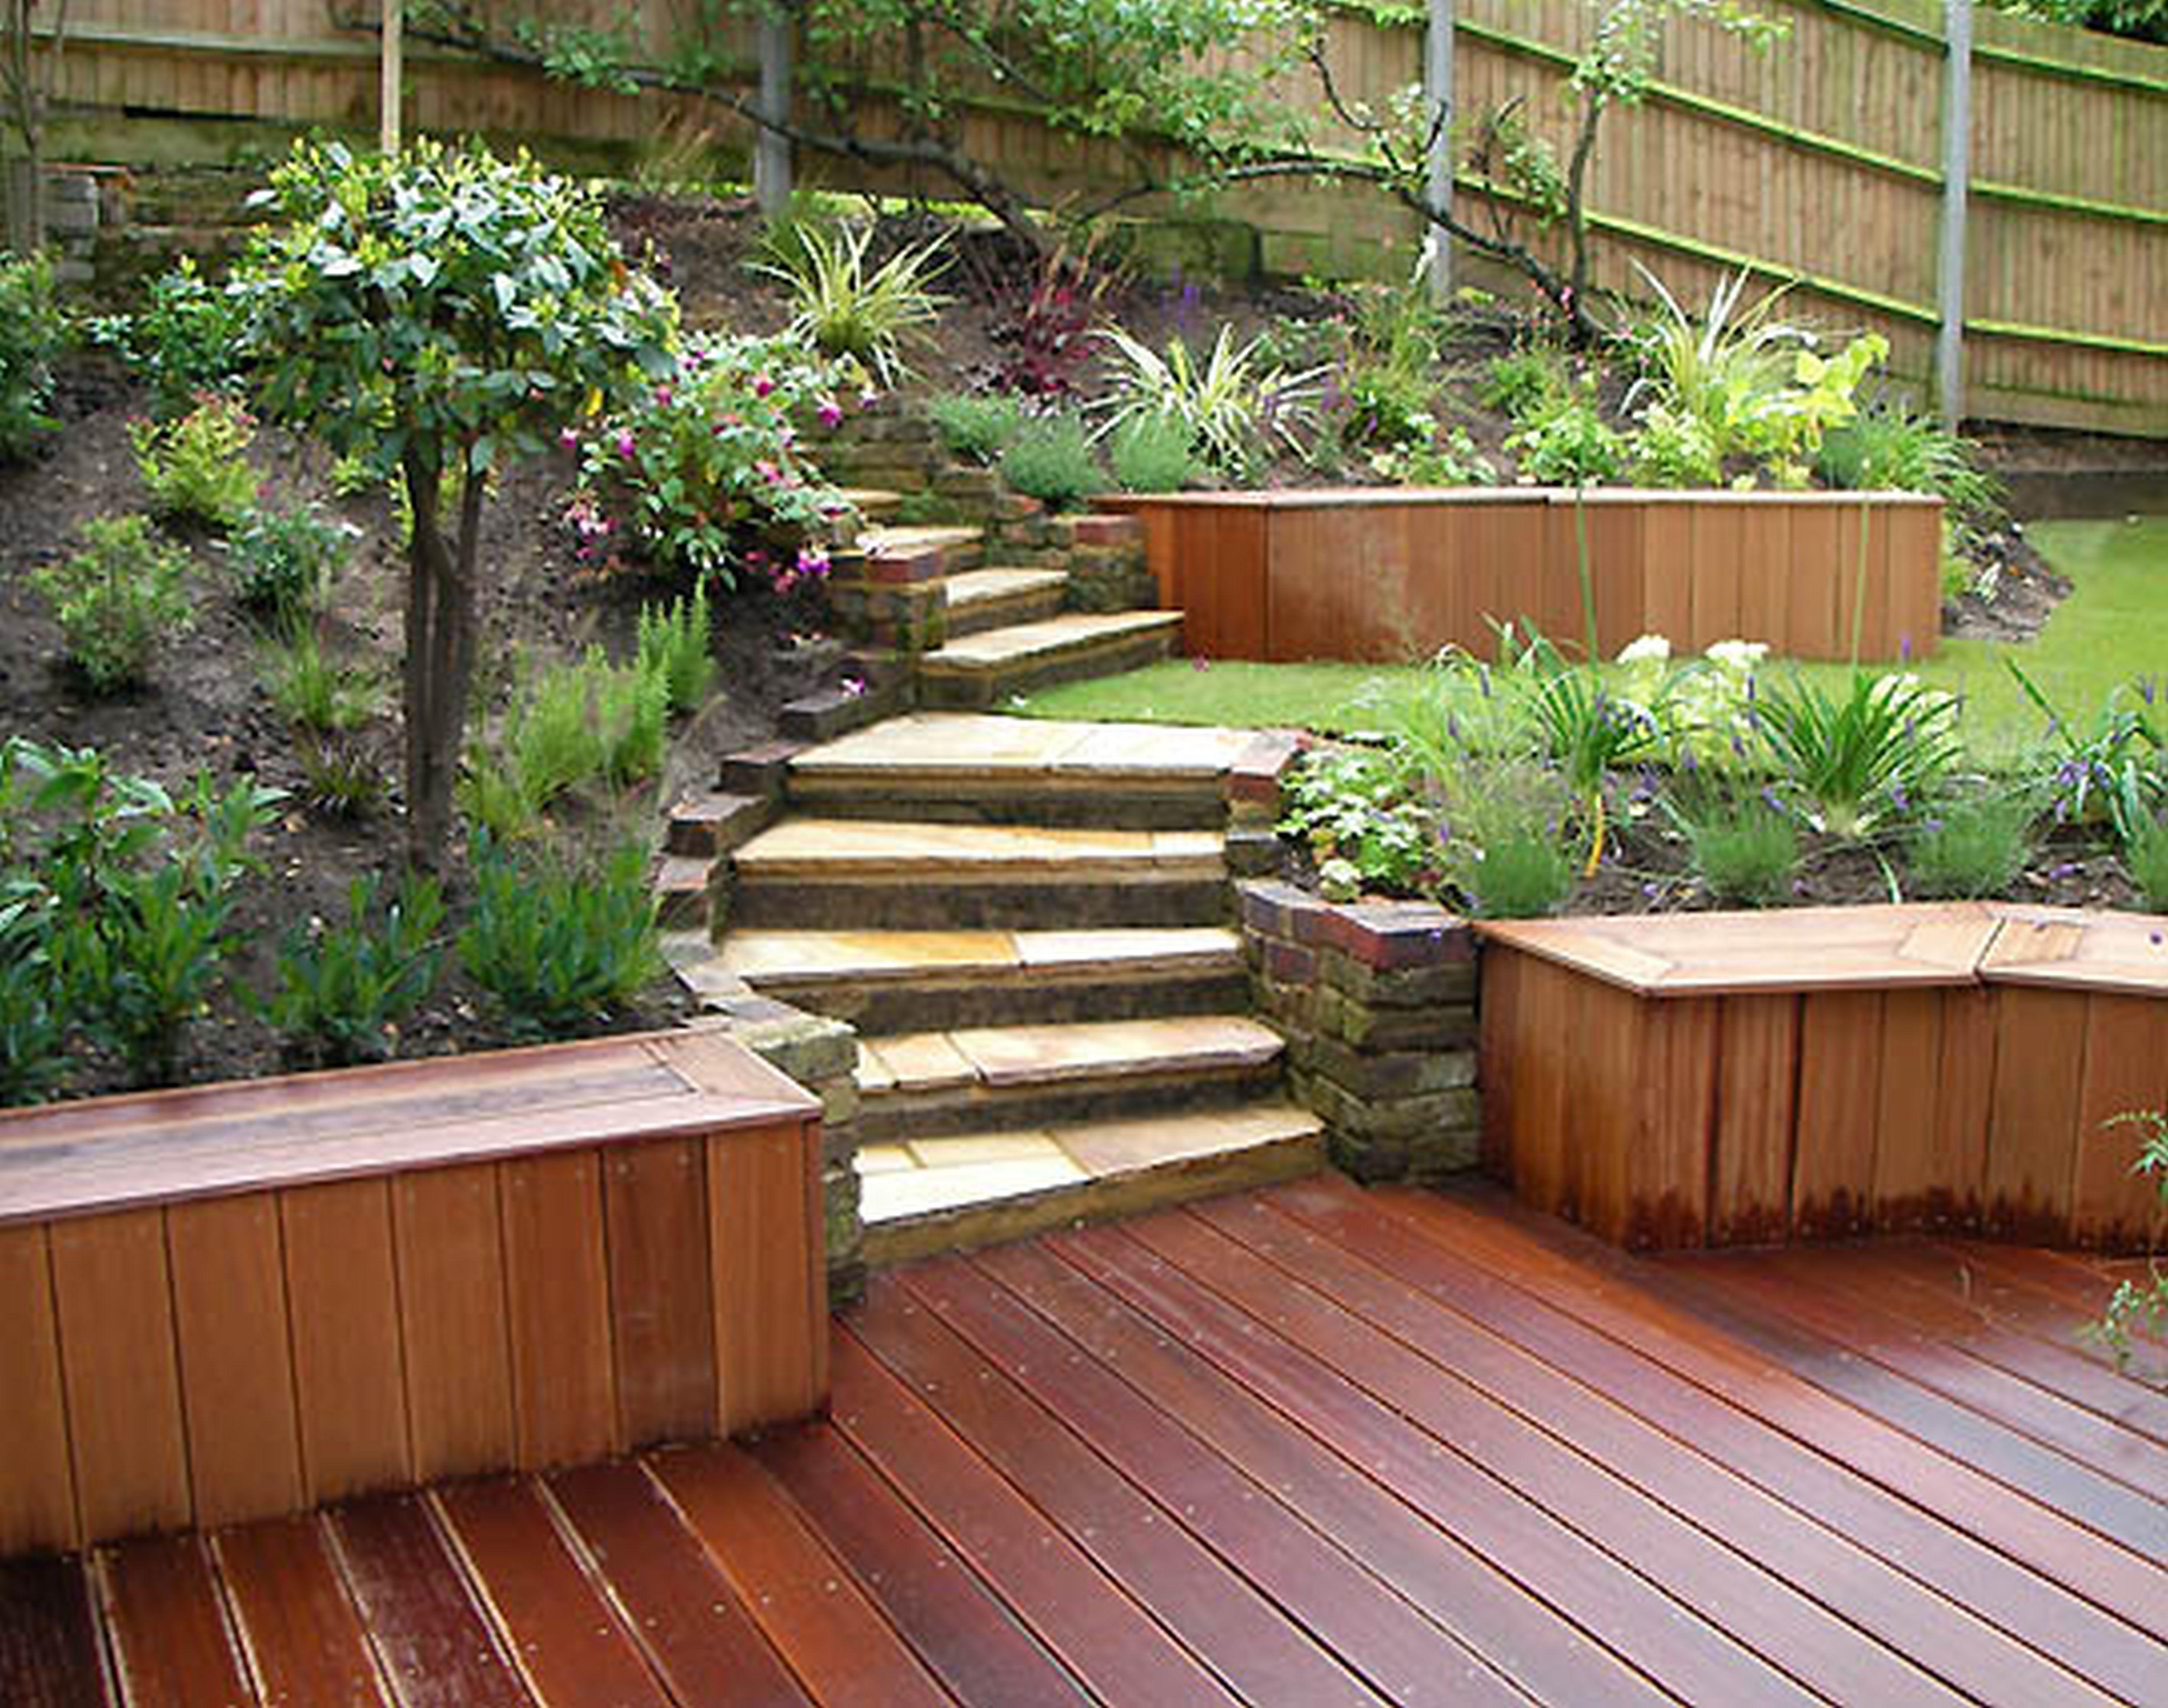 Patio Design Ideas   Outdoor Spaces   Pinterest   Patios, Gardens ...